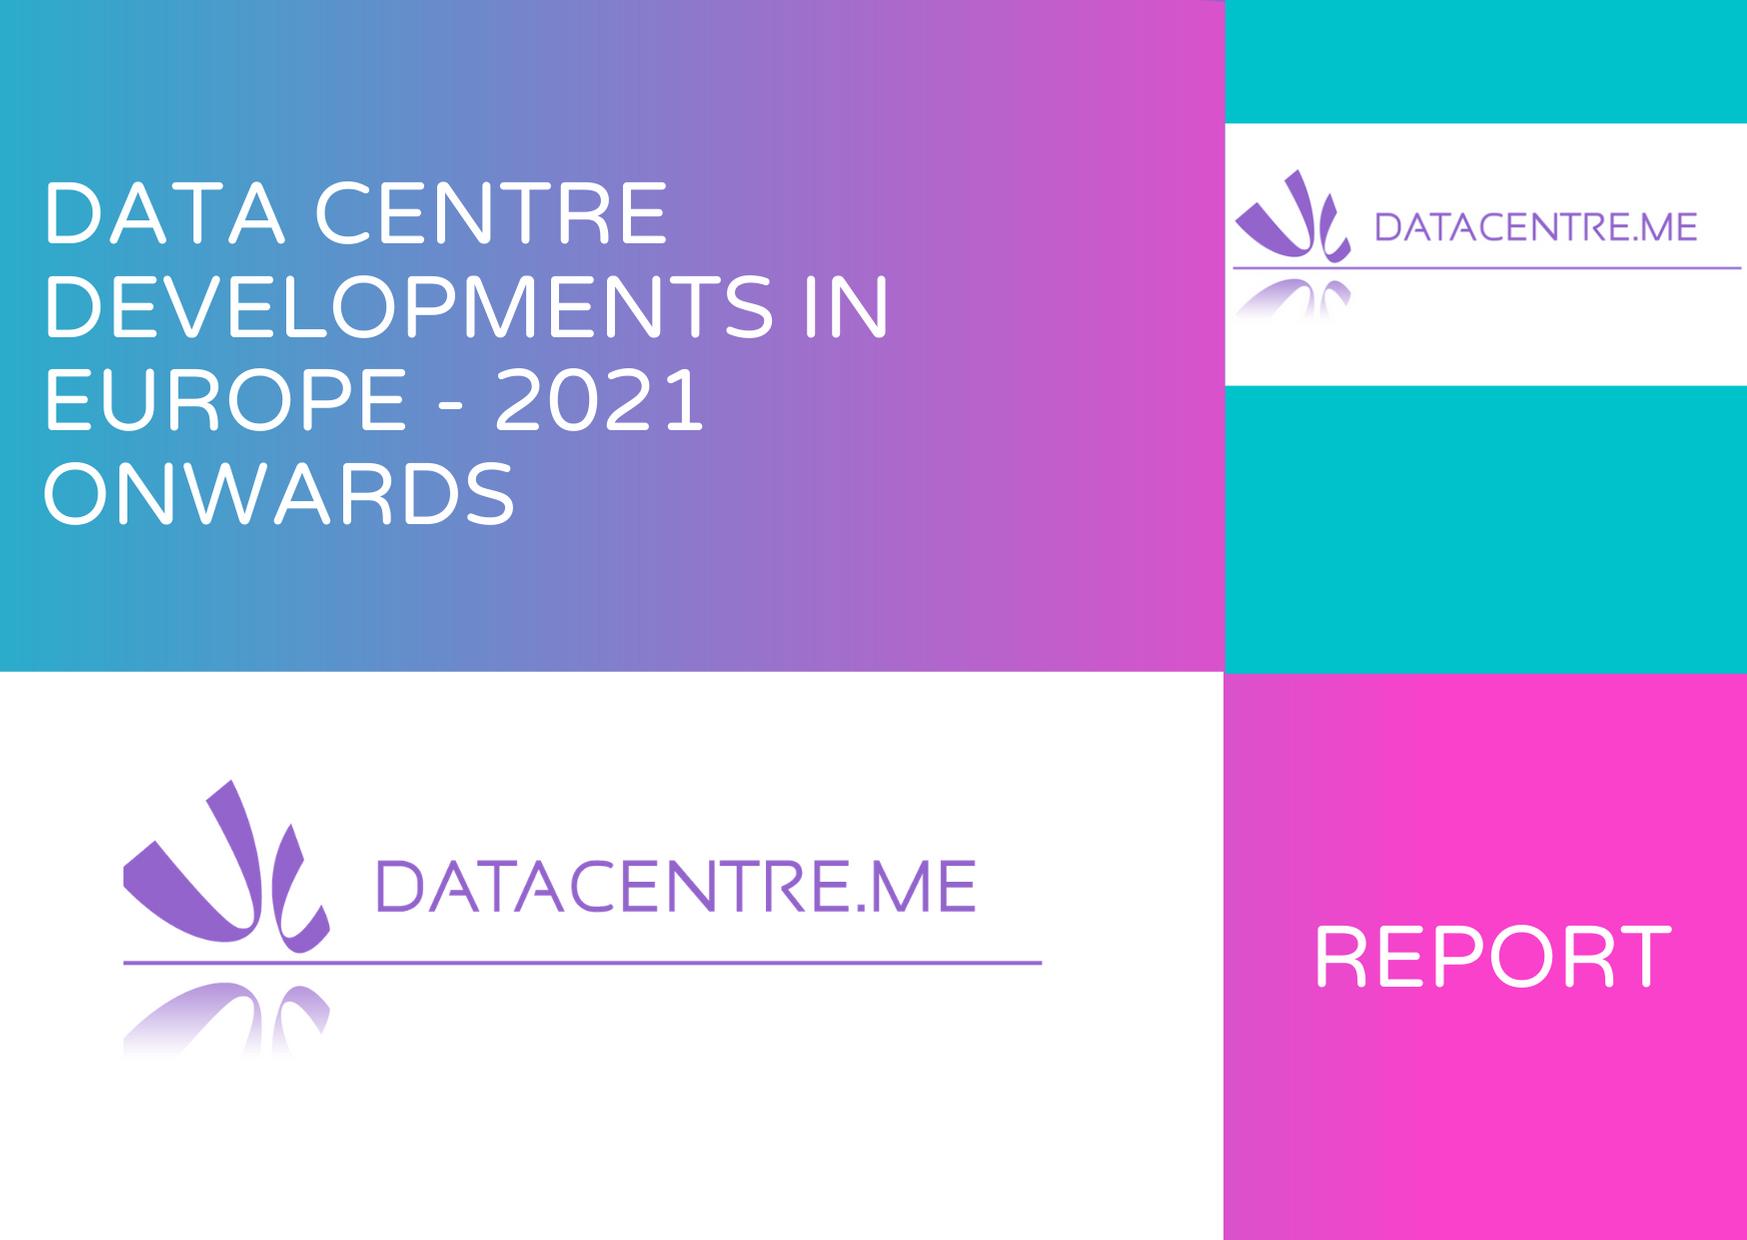 Data Centre Developments in Europe - 2021 Onwards - Gallery